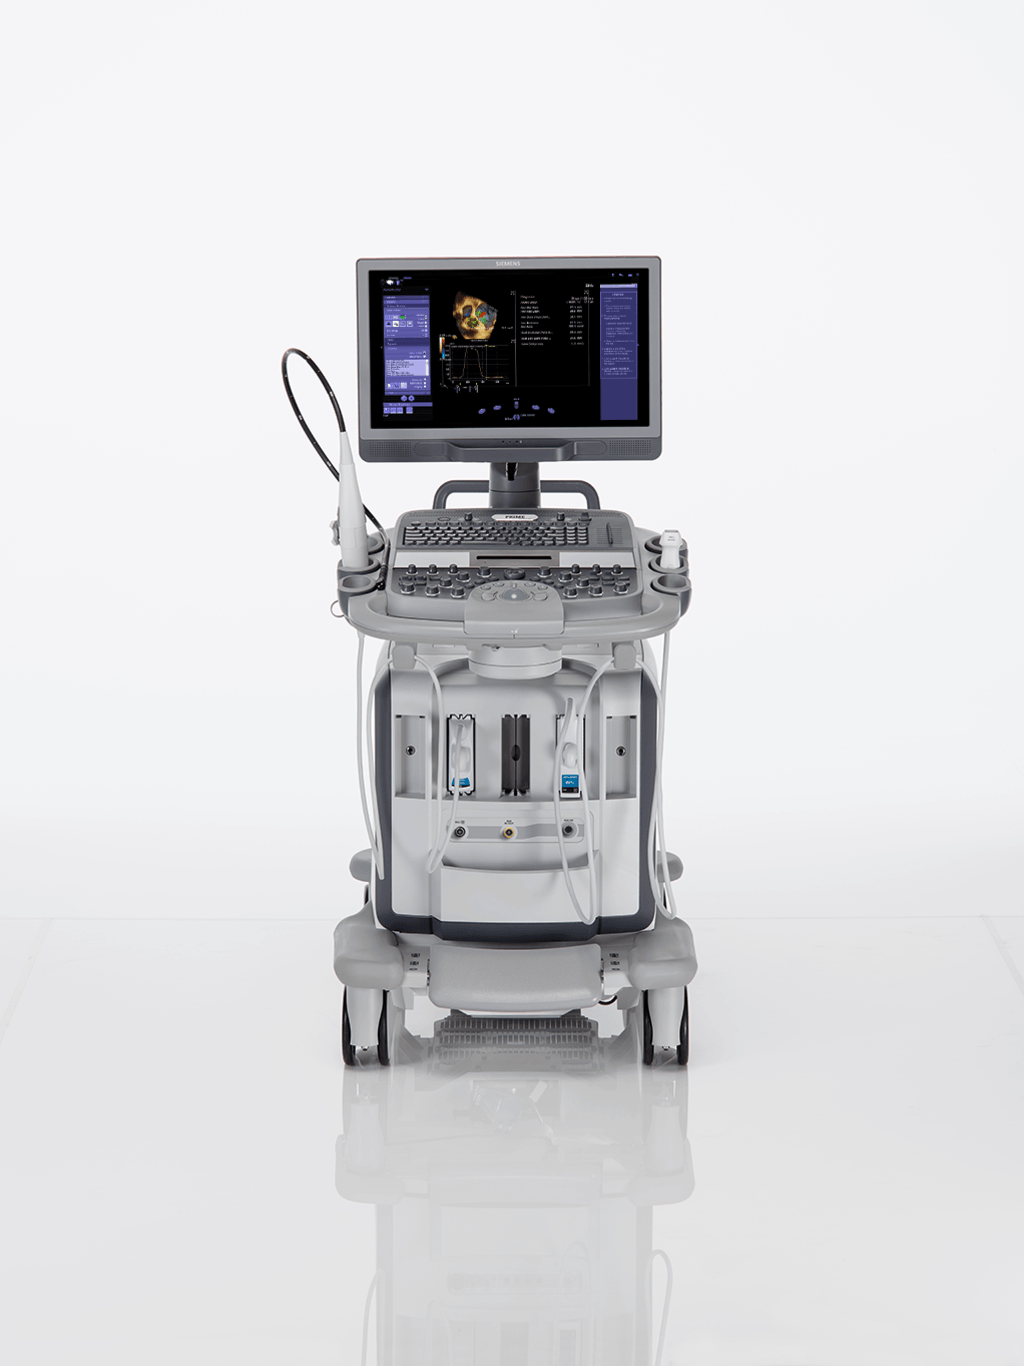 Siemens SC2000 Ultrasound System